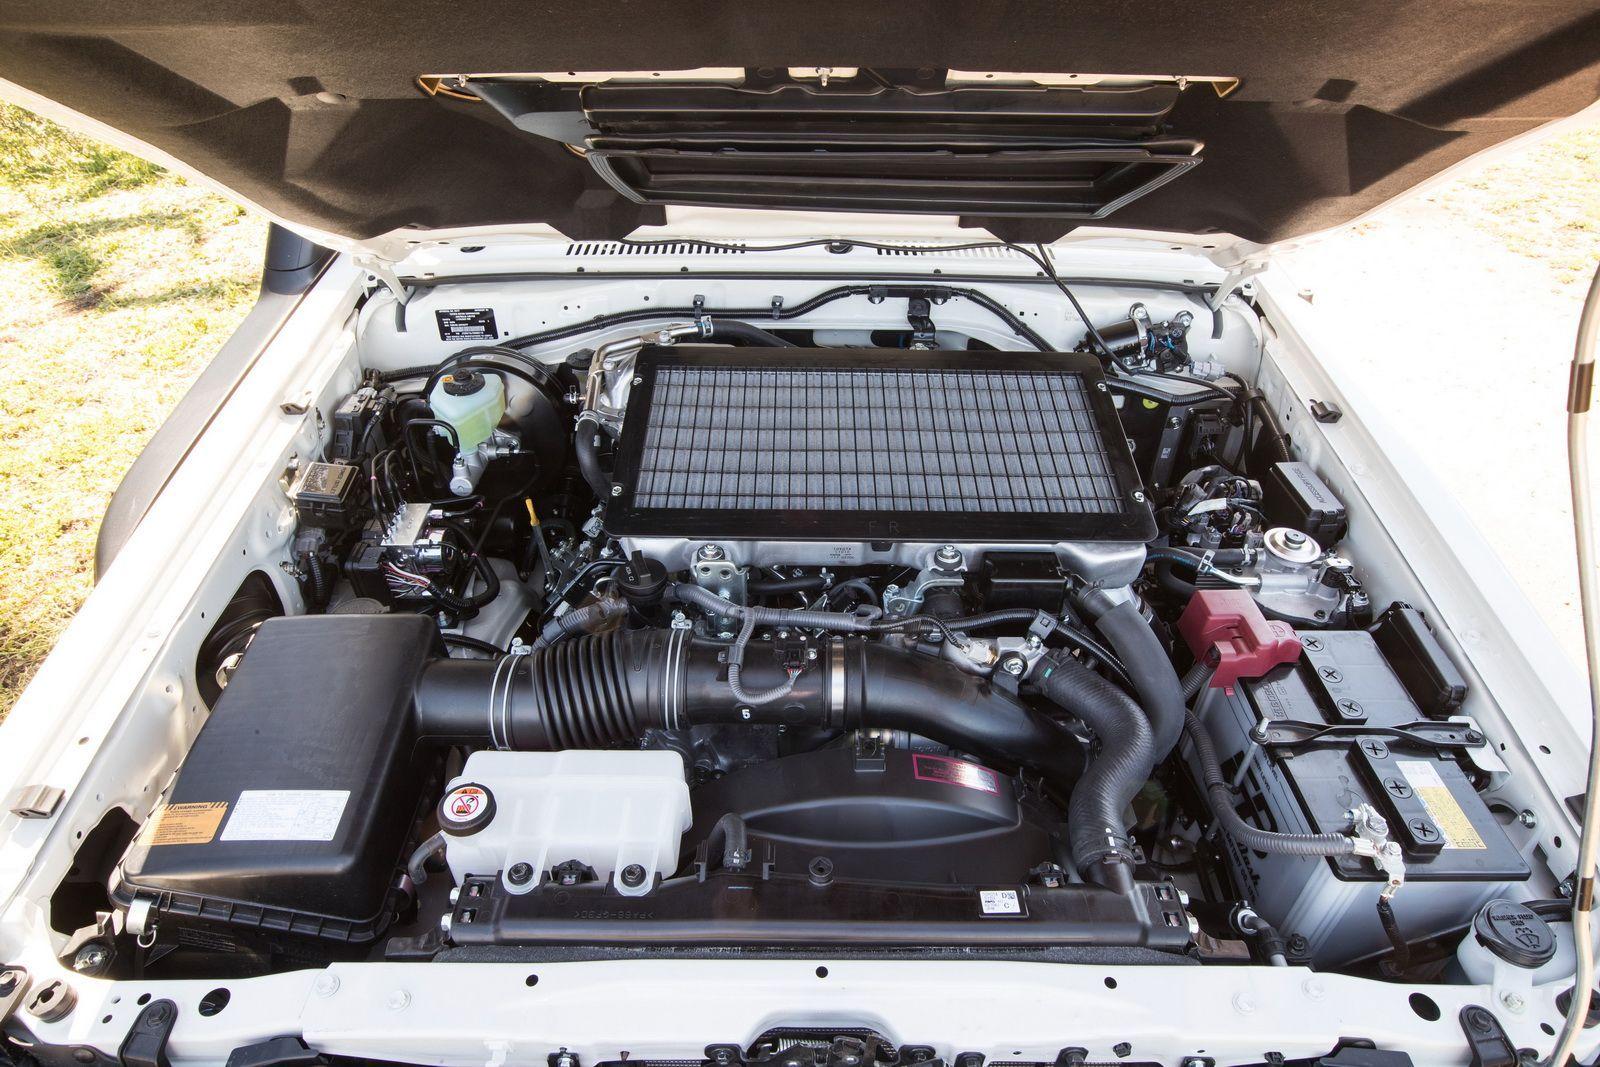 2016 Toyota LandCruiser 70 Series engine